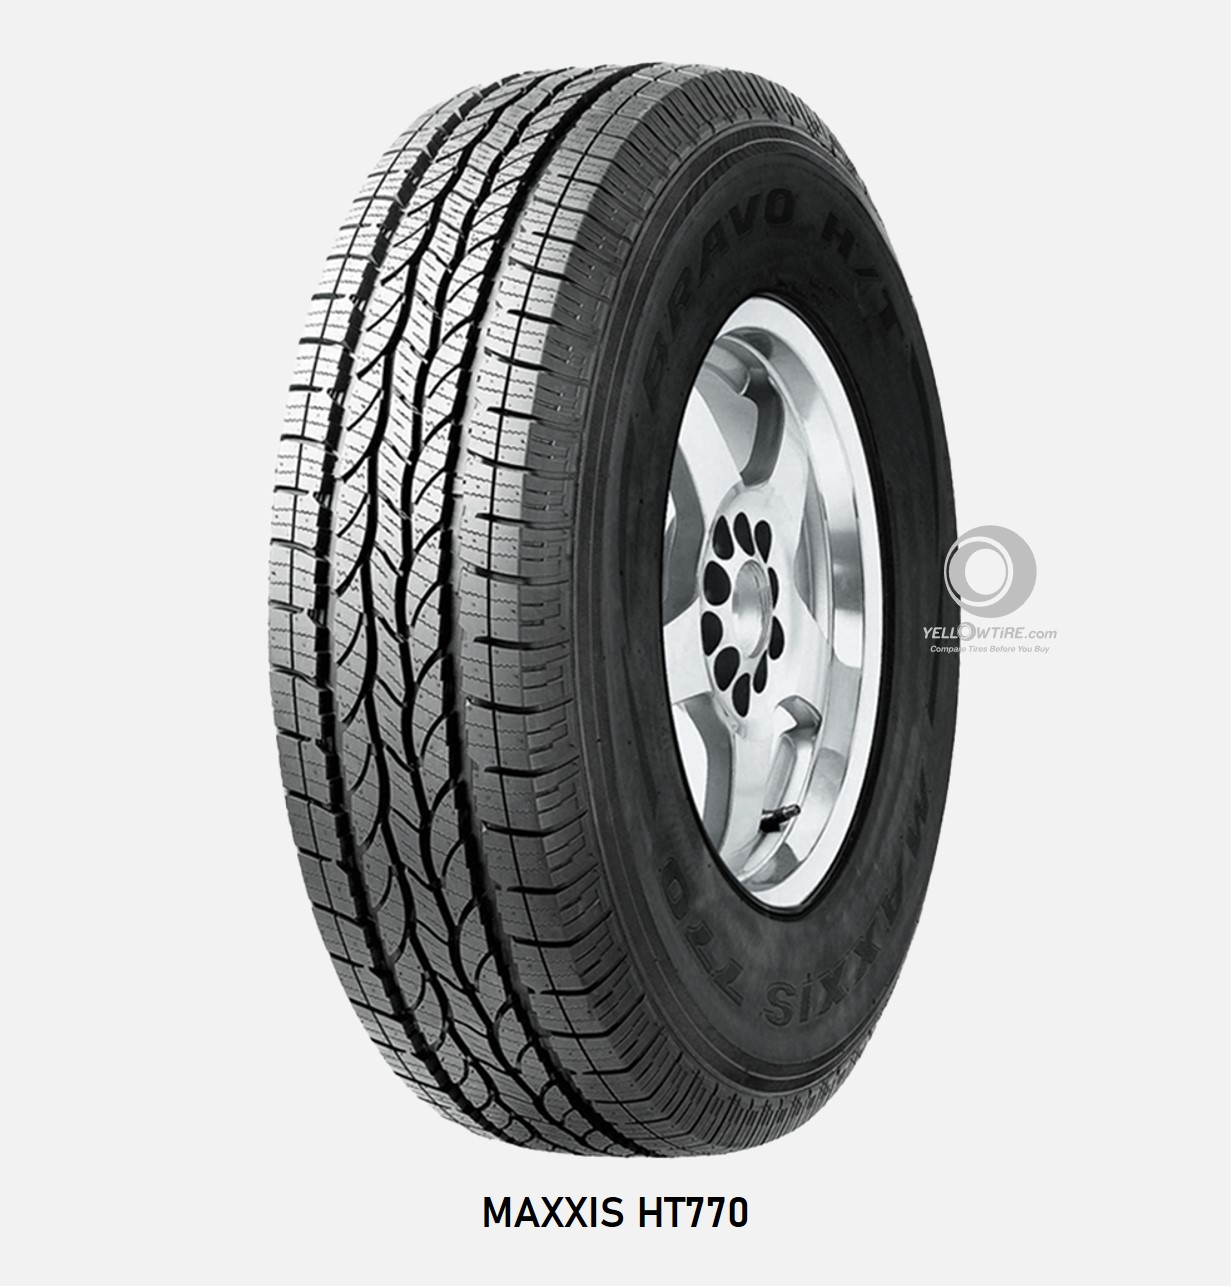 MAXXIS HT770